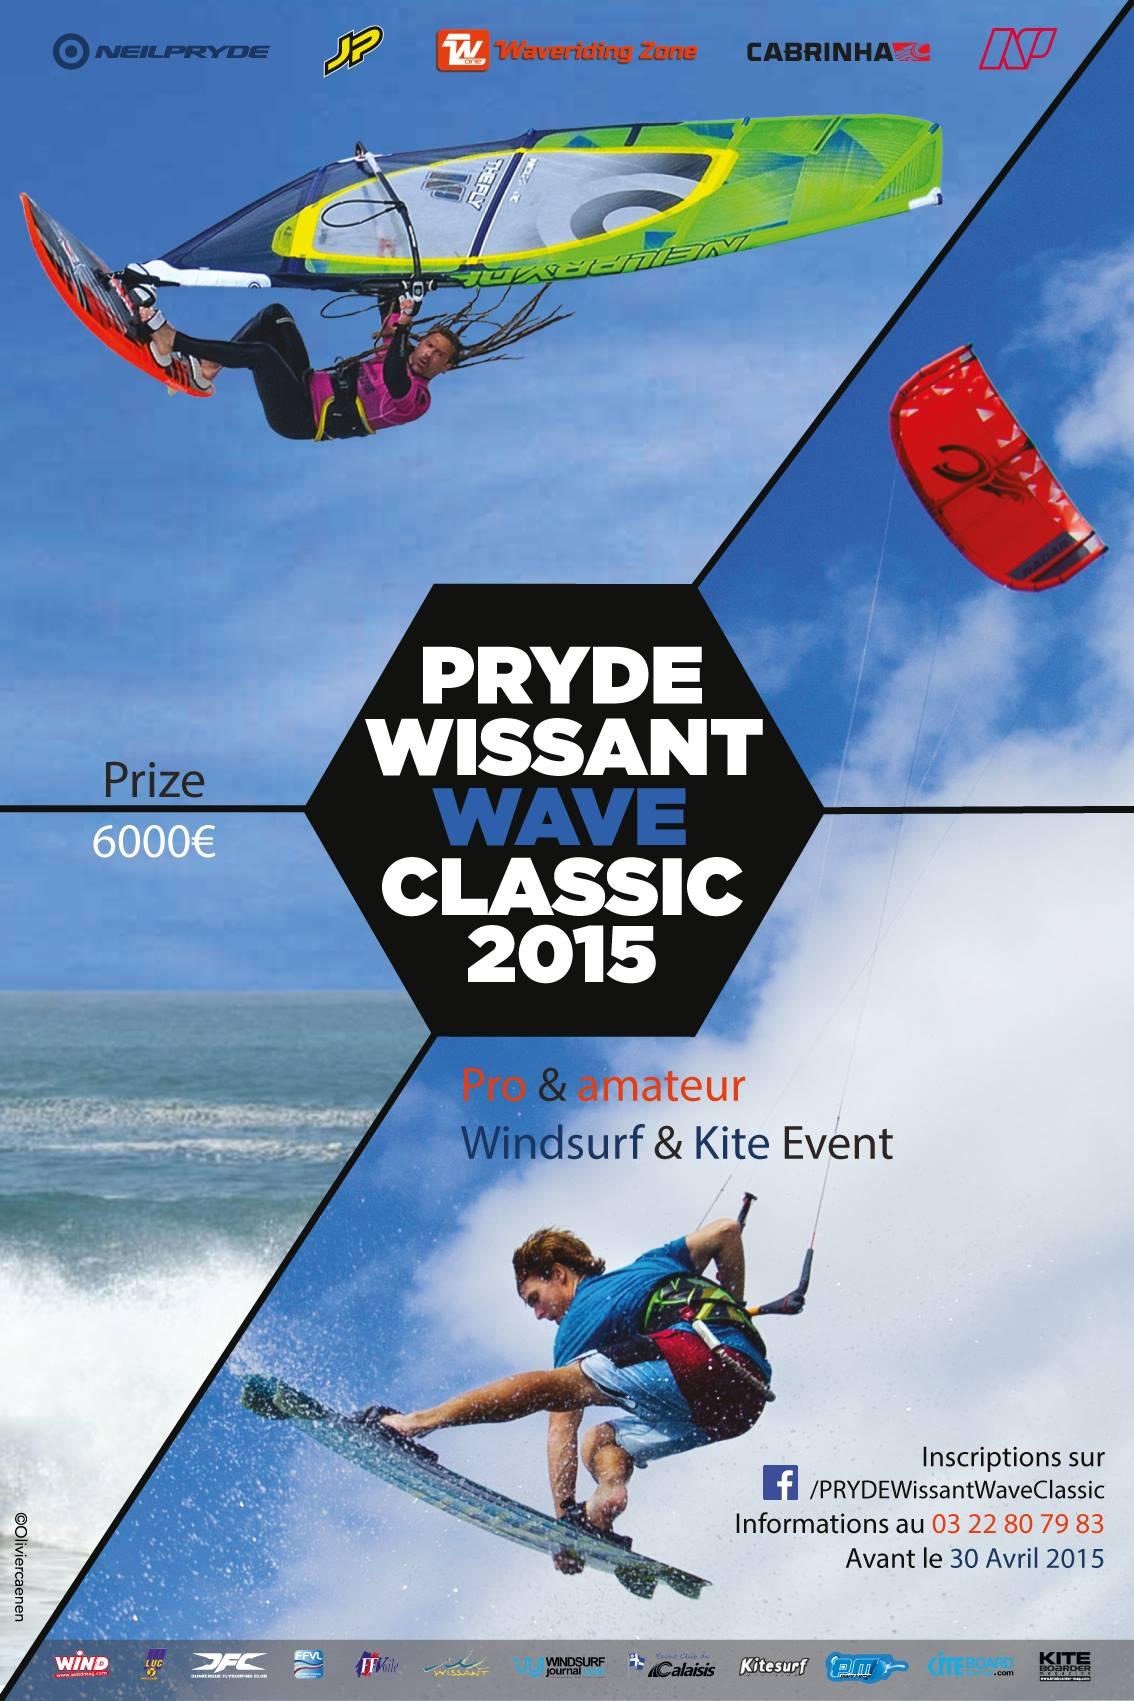 Pryde Wissant Wave Classic 2015